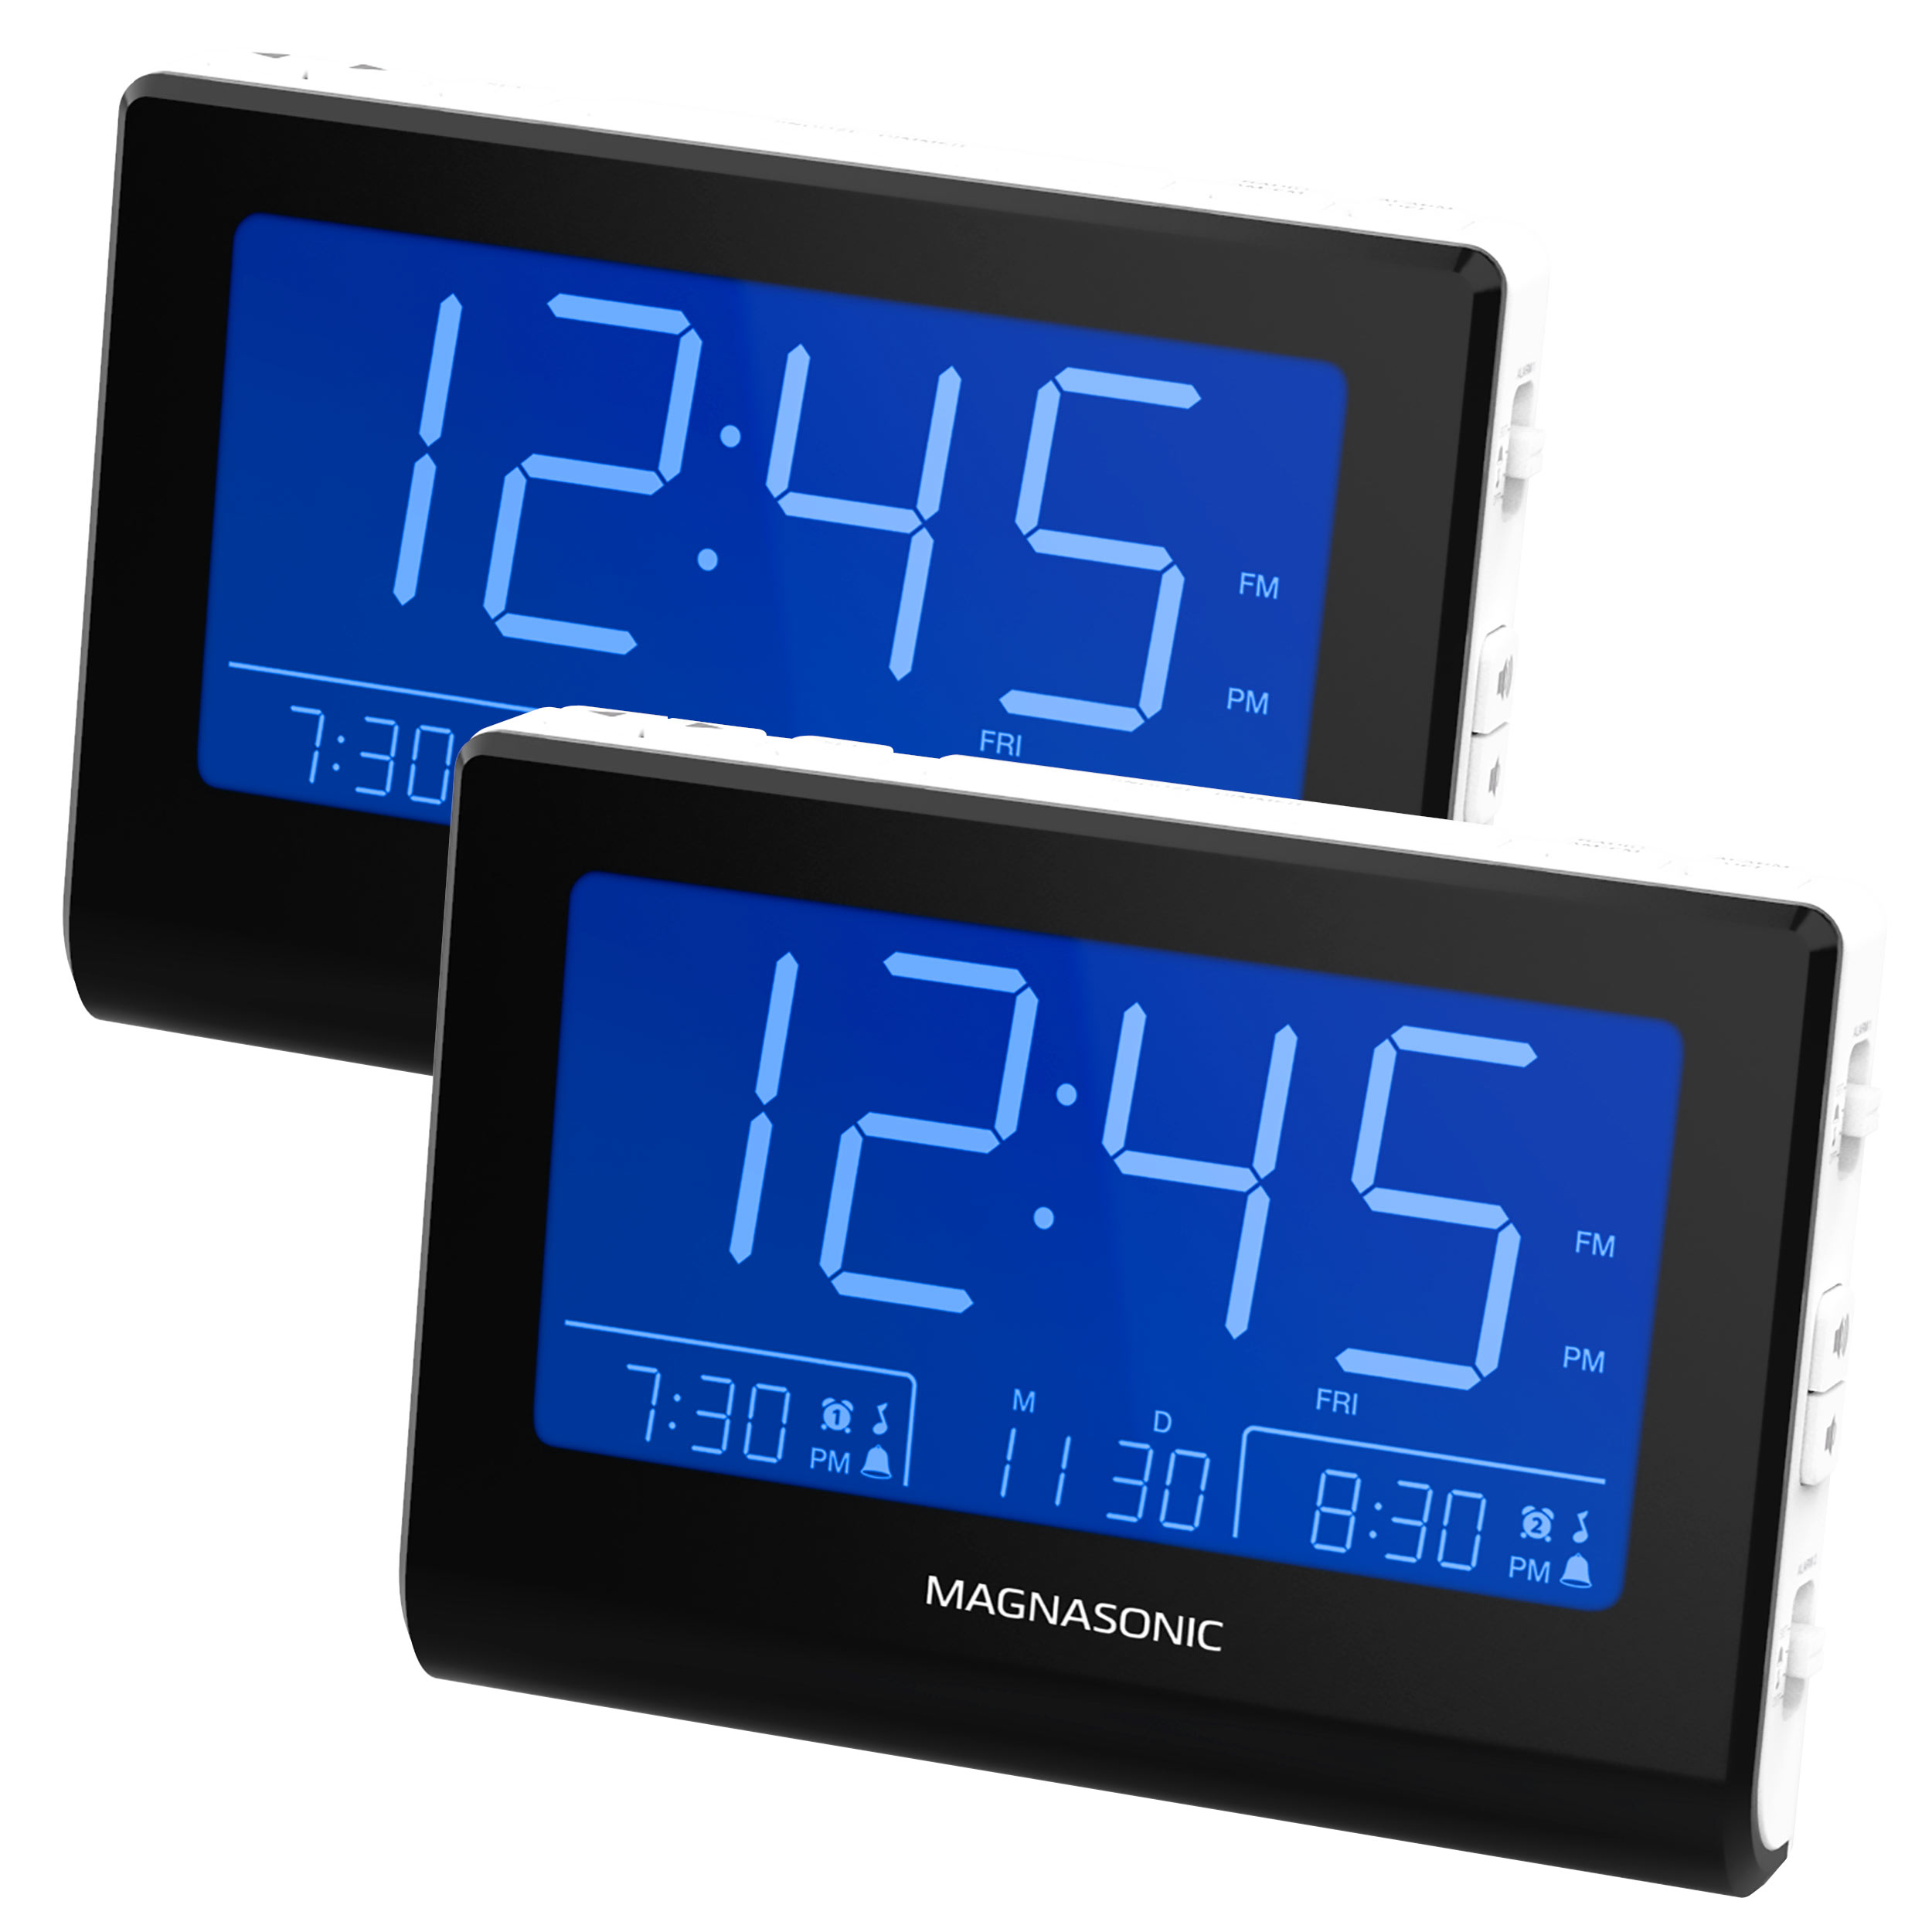 "Magnasonic Alarm Clock Radio with Battery Backup, Dual Gradual Wake Alarm, Adjustable Brightness, Daylight Savings Time, Large 4.8"" LED Display, AM/FM, Sleep Timer, Day/Date Display (CR61W) - 2 Pack"